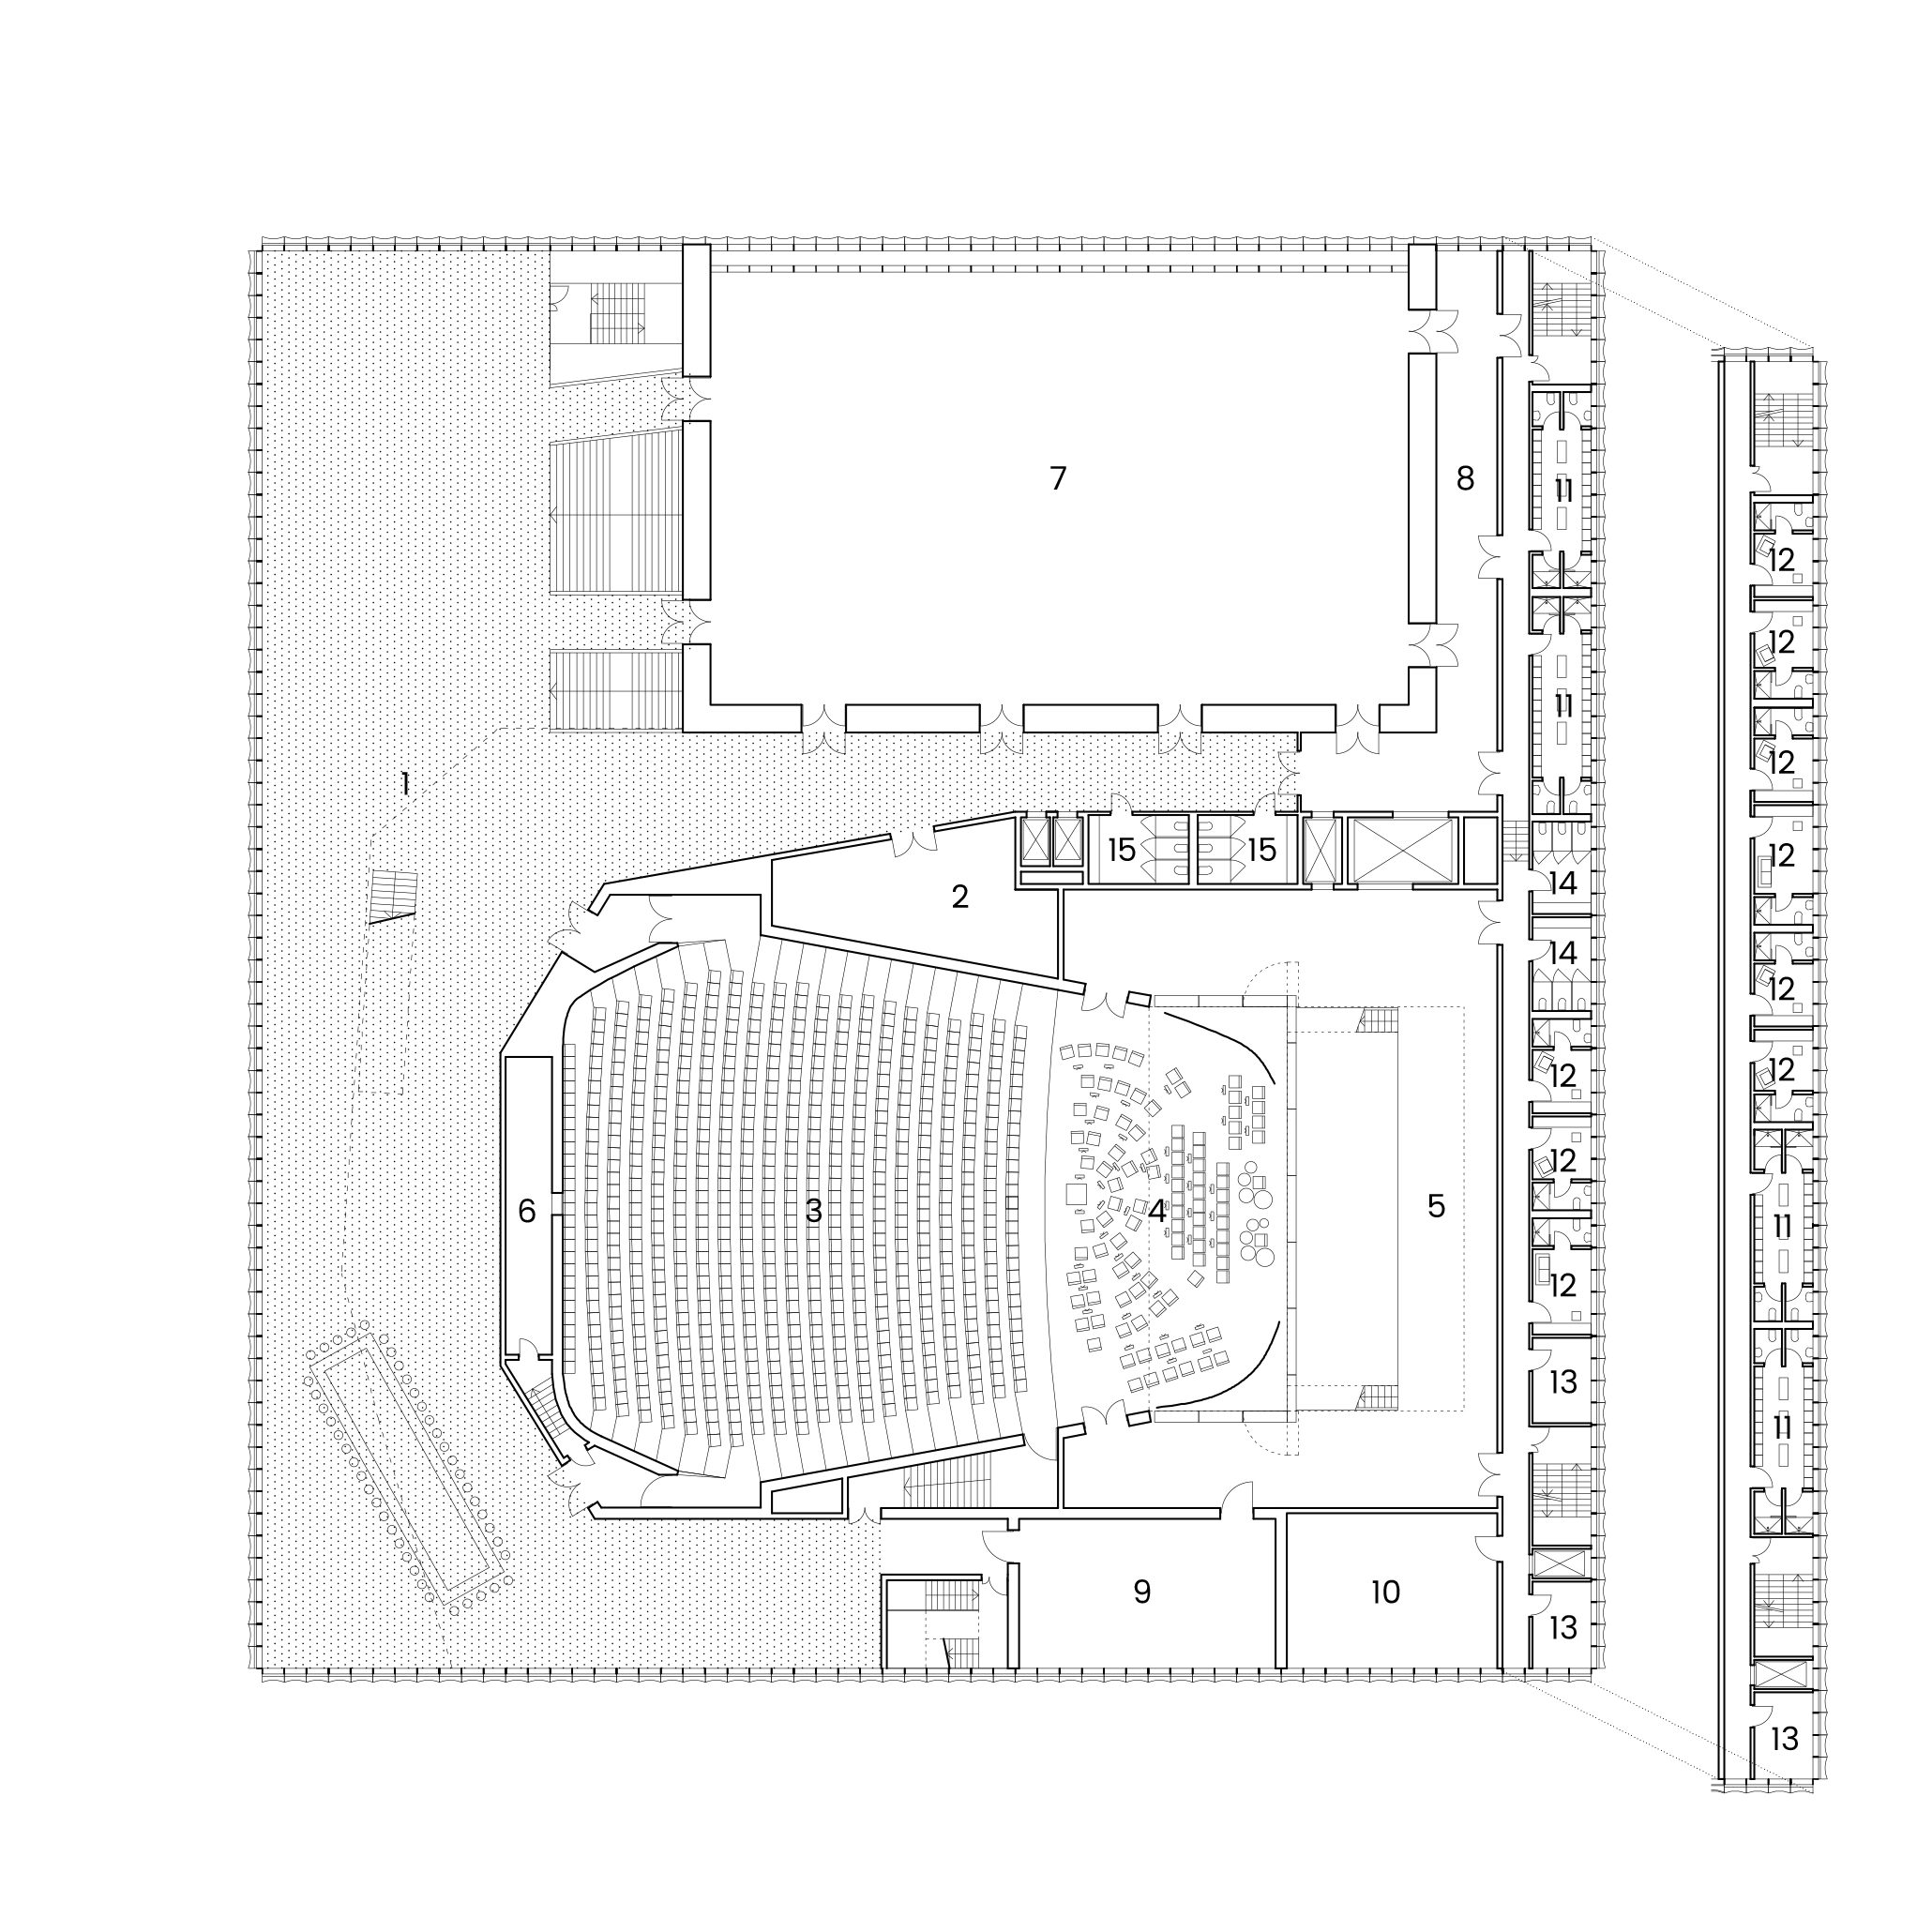 čiurlionio koncertų centras